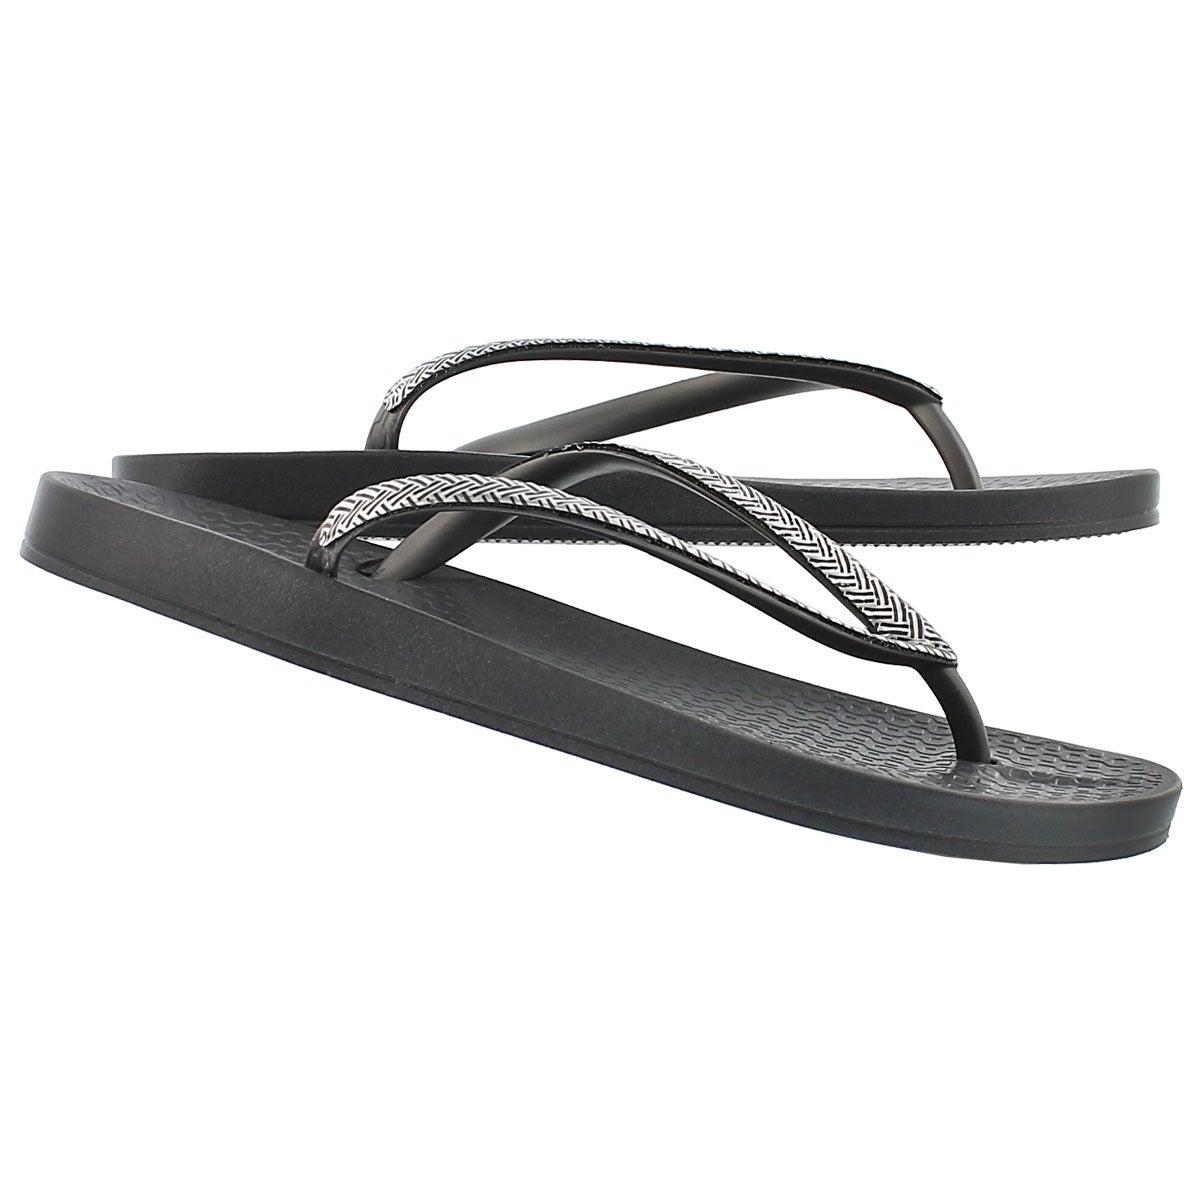 Sandale tong MESH FEM, gris/arg, fem